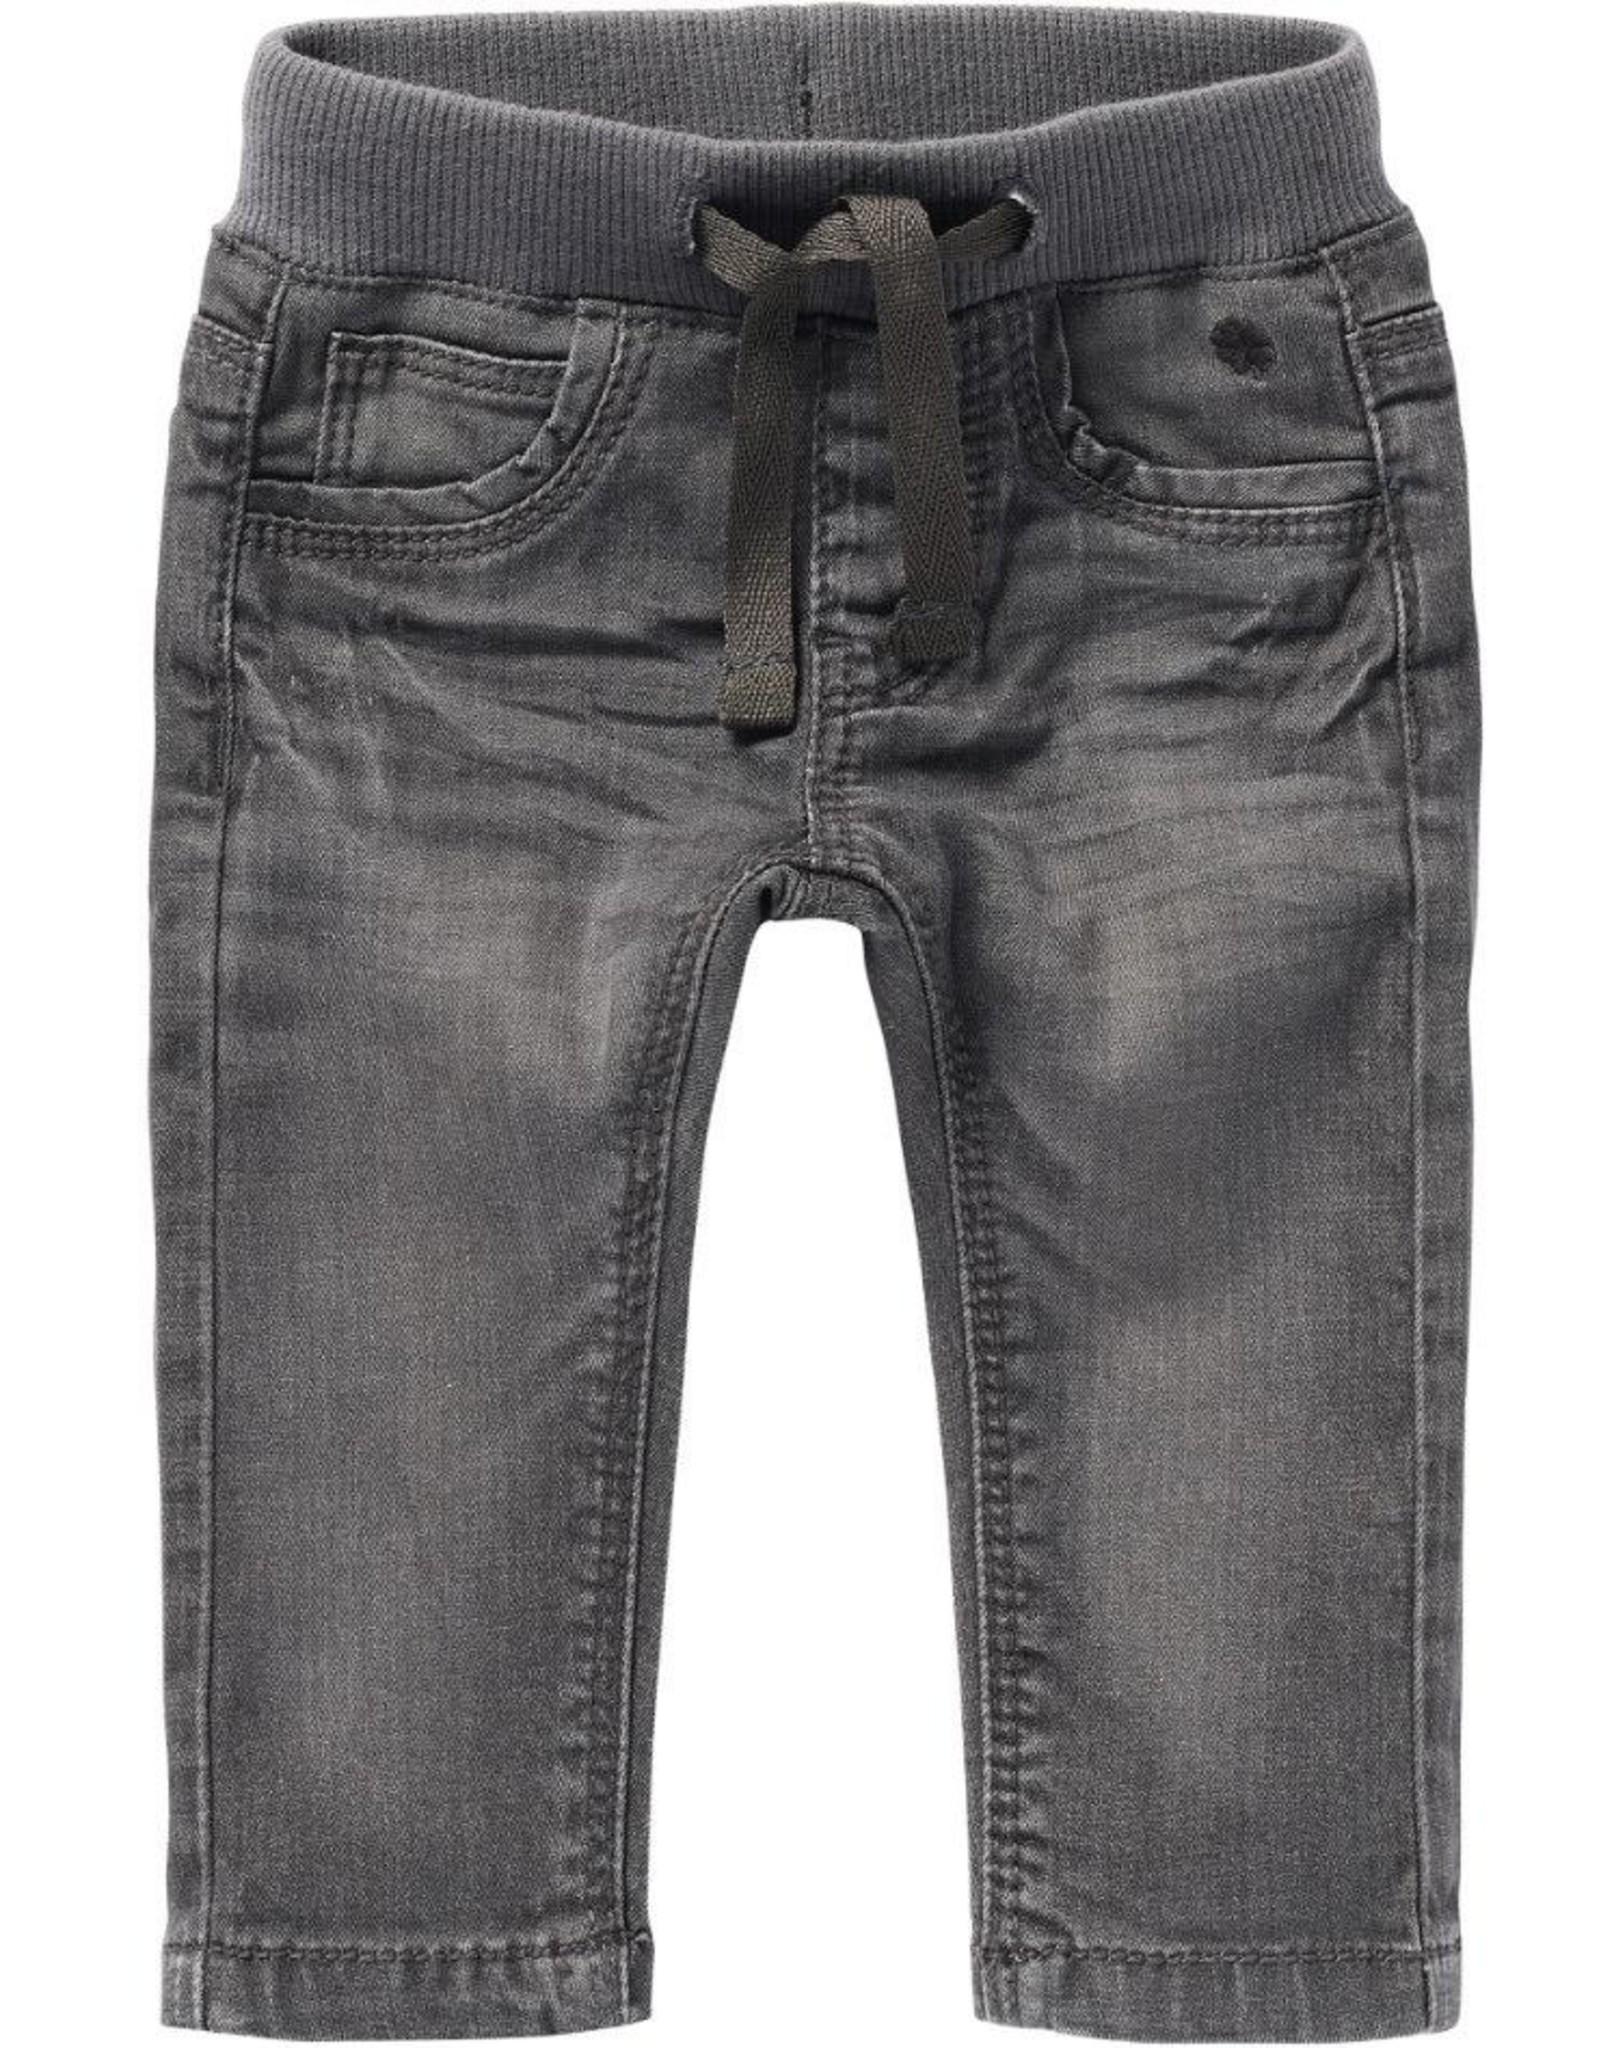 Noppies Kids Navoi Light Grey Denim Jeans